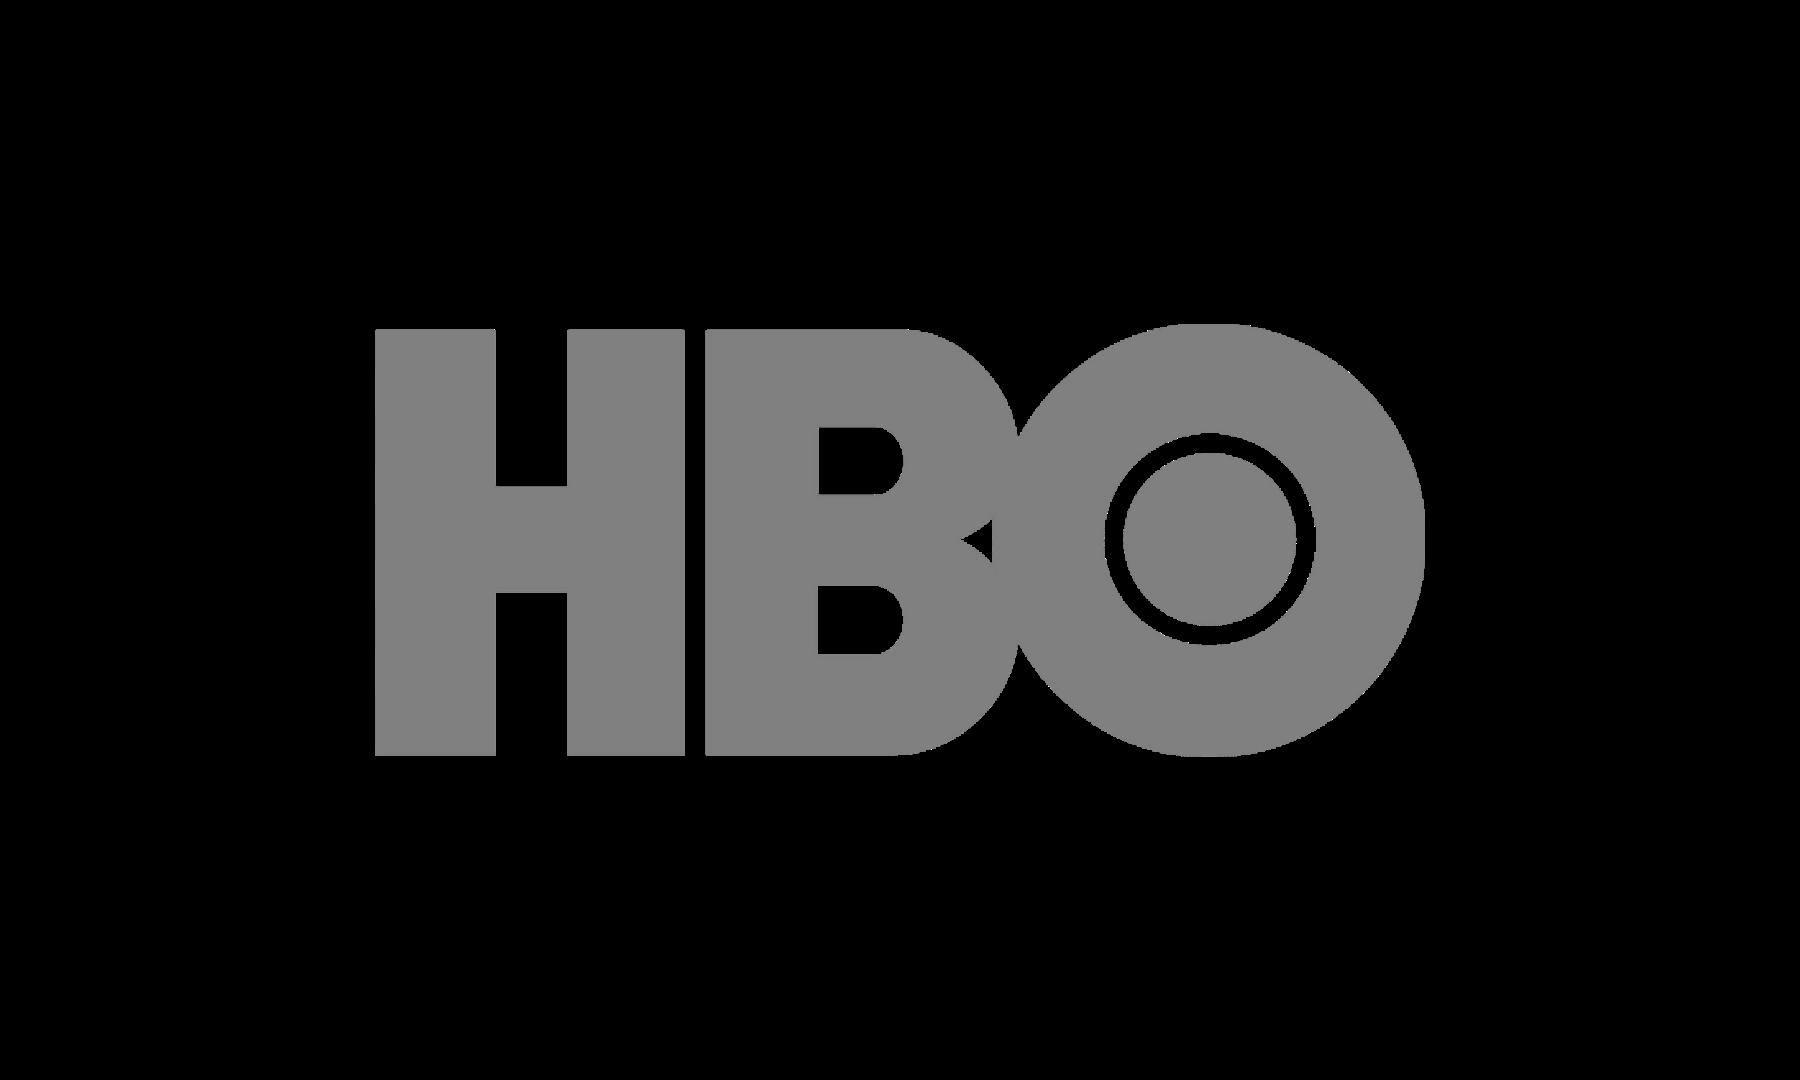 HBO-grey-logo